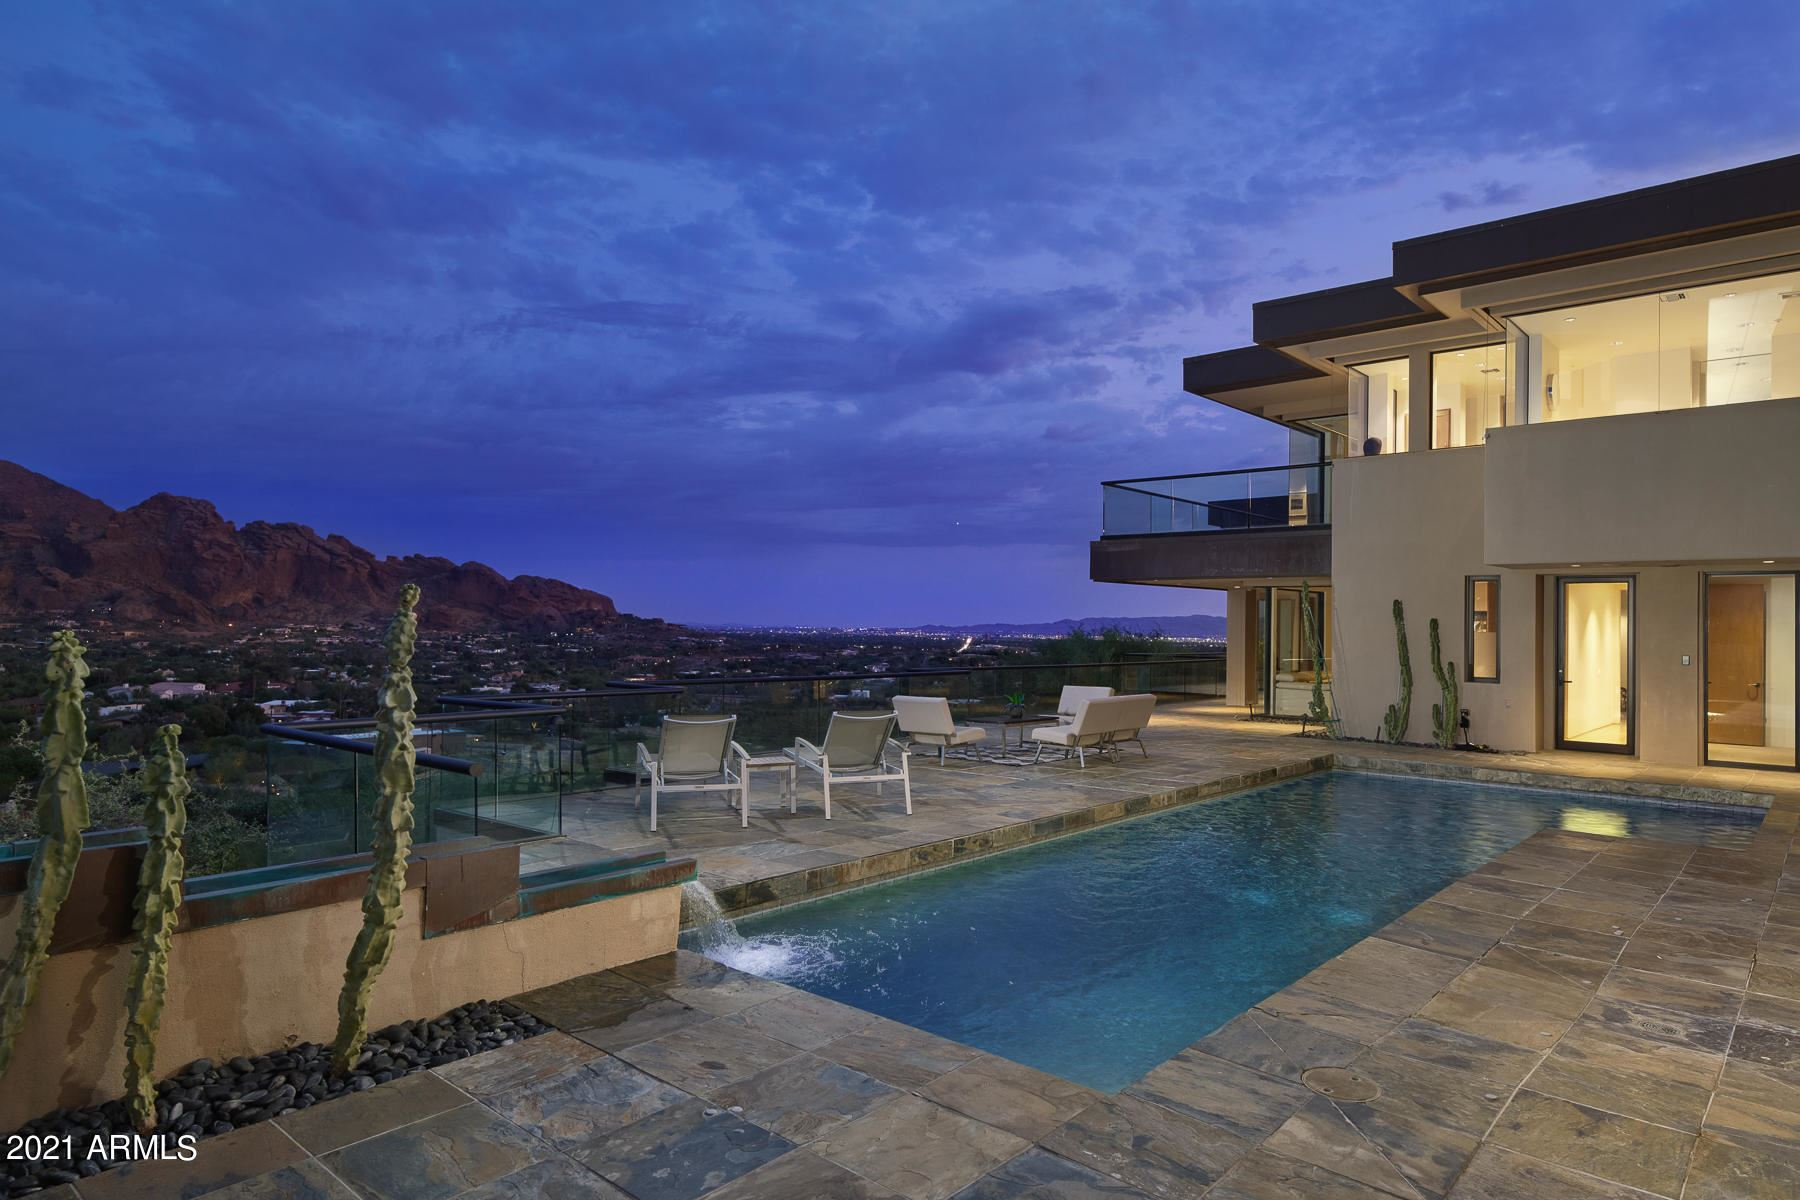 Photo of 6901 N HIGHLANDS Road, Paradise Valley, AZ 85253 (MLS # 6266810)